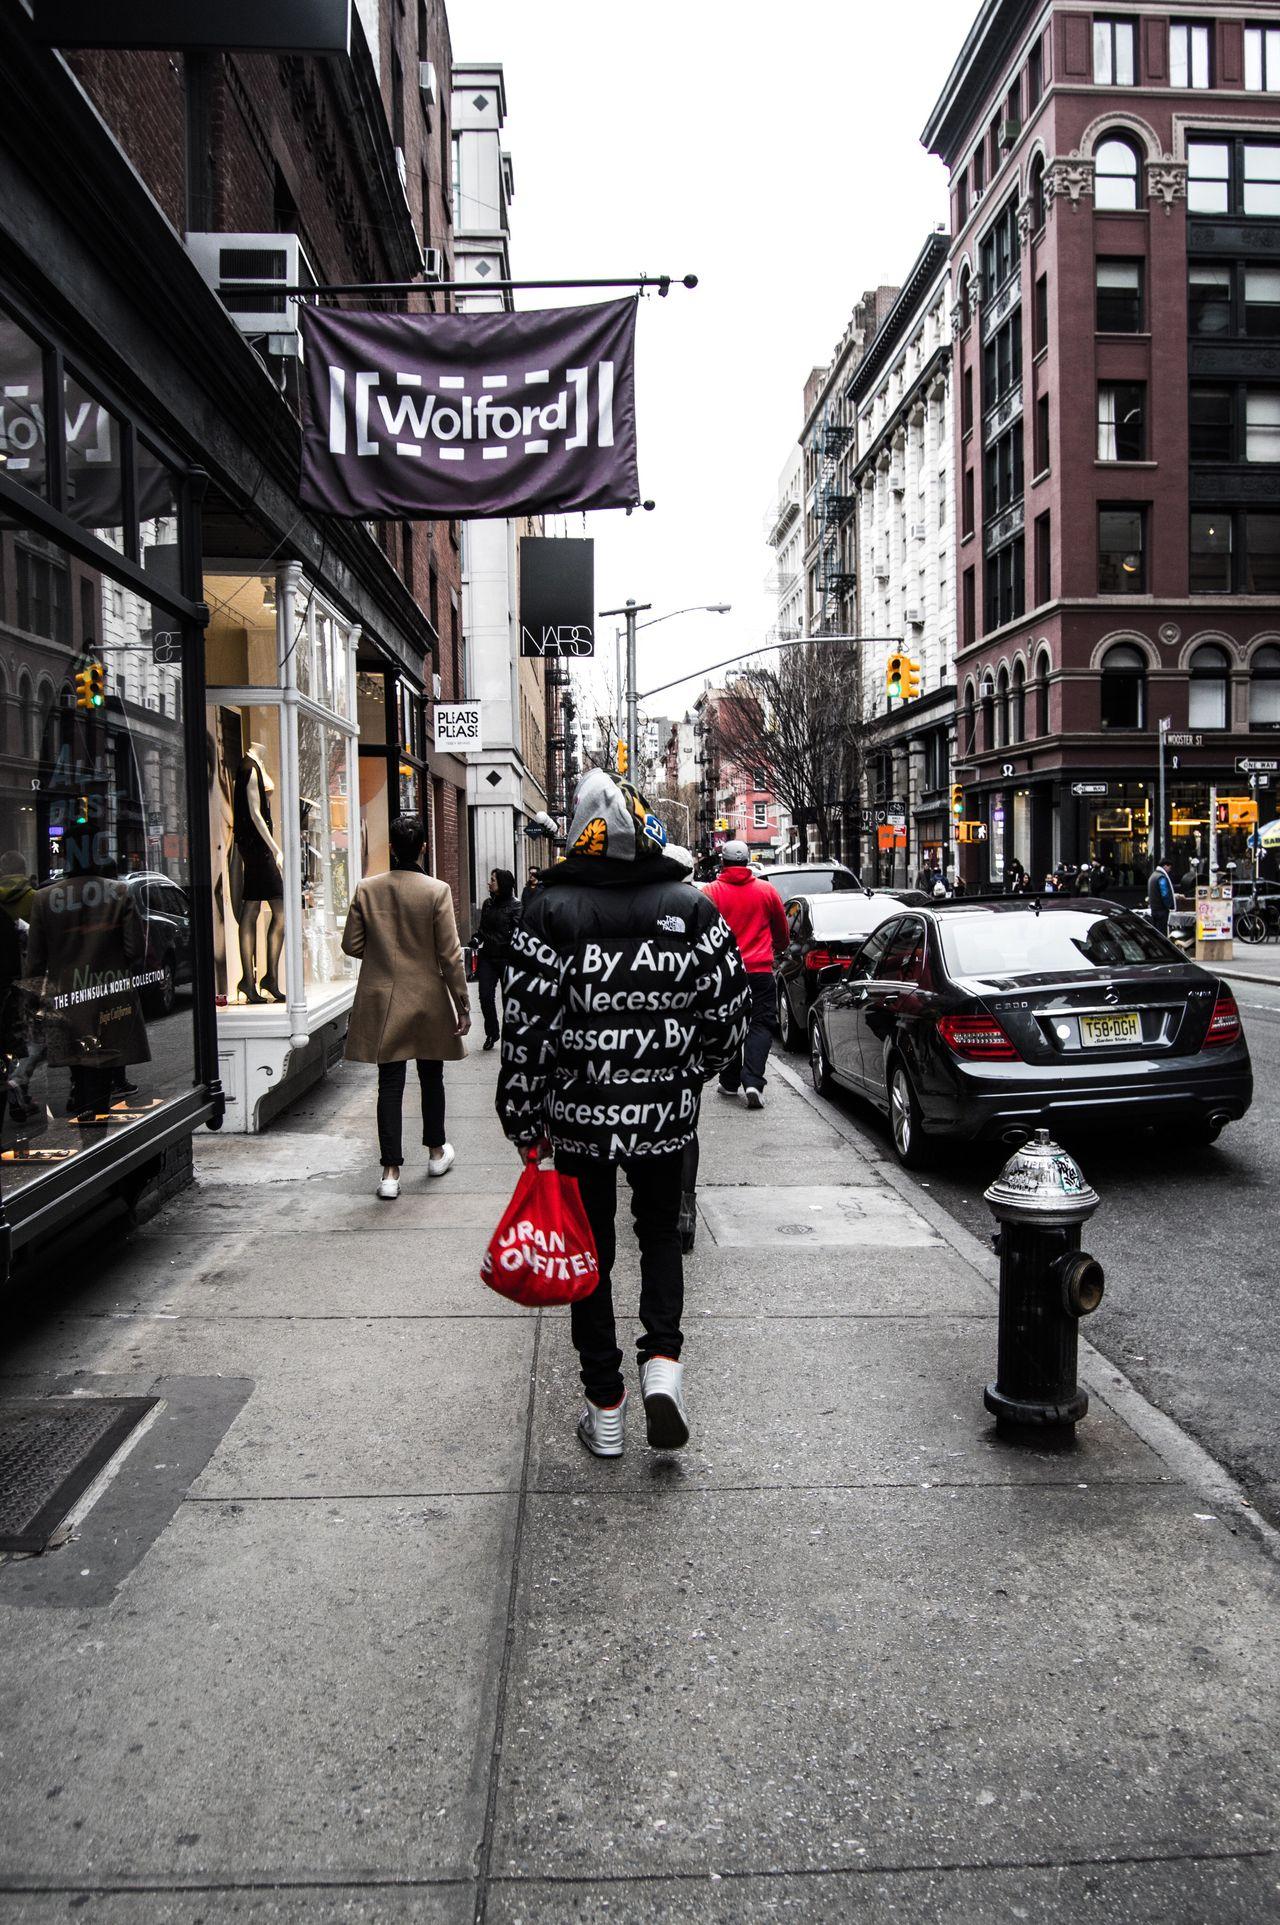 Got funk swag with a hat to match! EyeEmNewHere Urban Fashion Fashion Photography Canon Streetphotography Swag New York Newyorkcity Manhattan Style Street Fashion Streetfashion